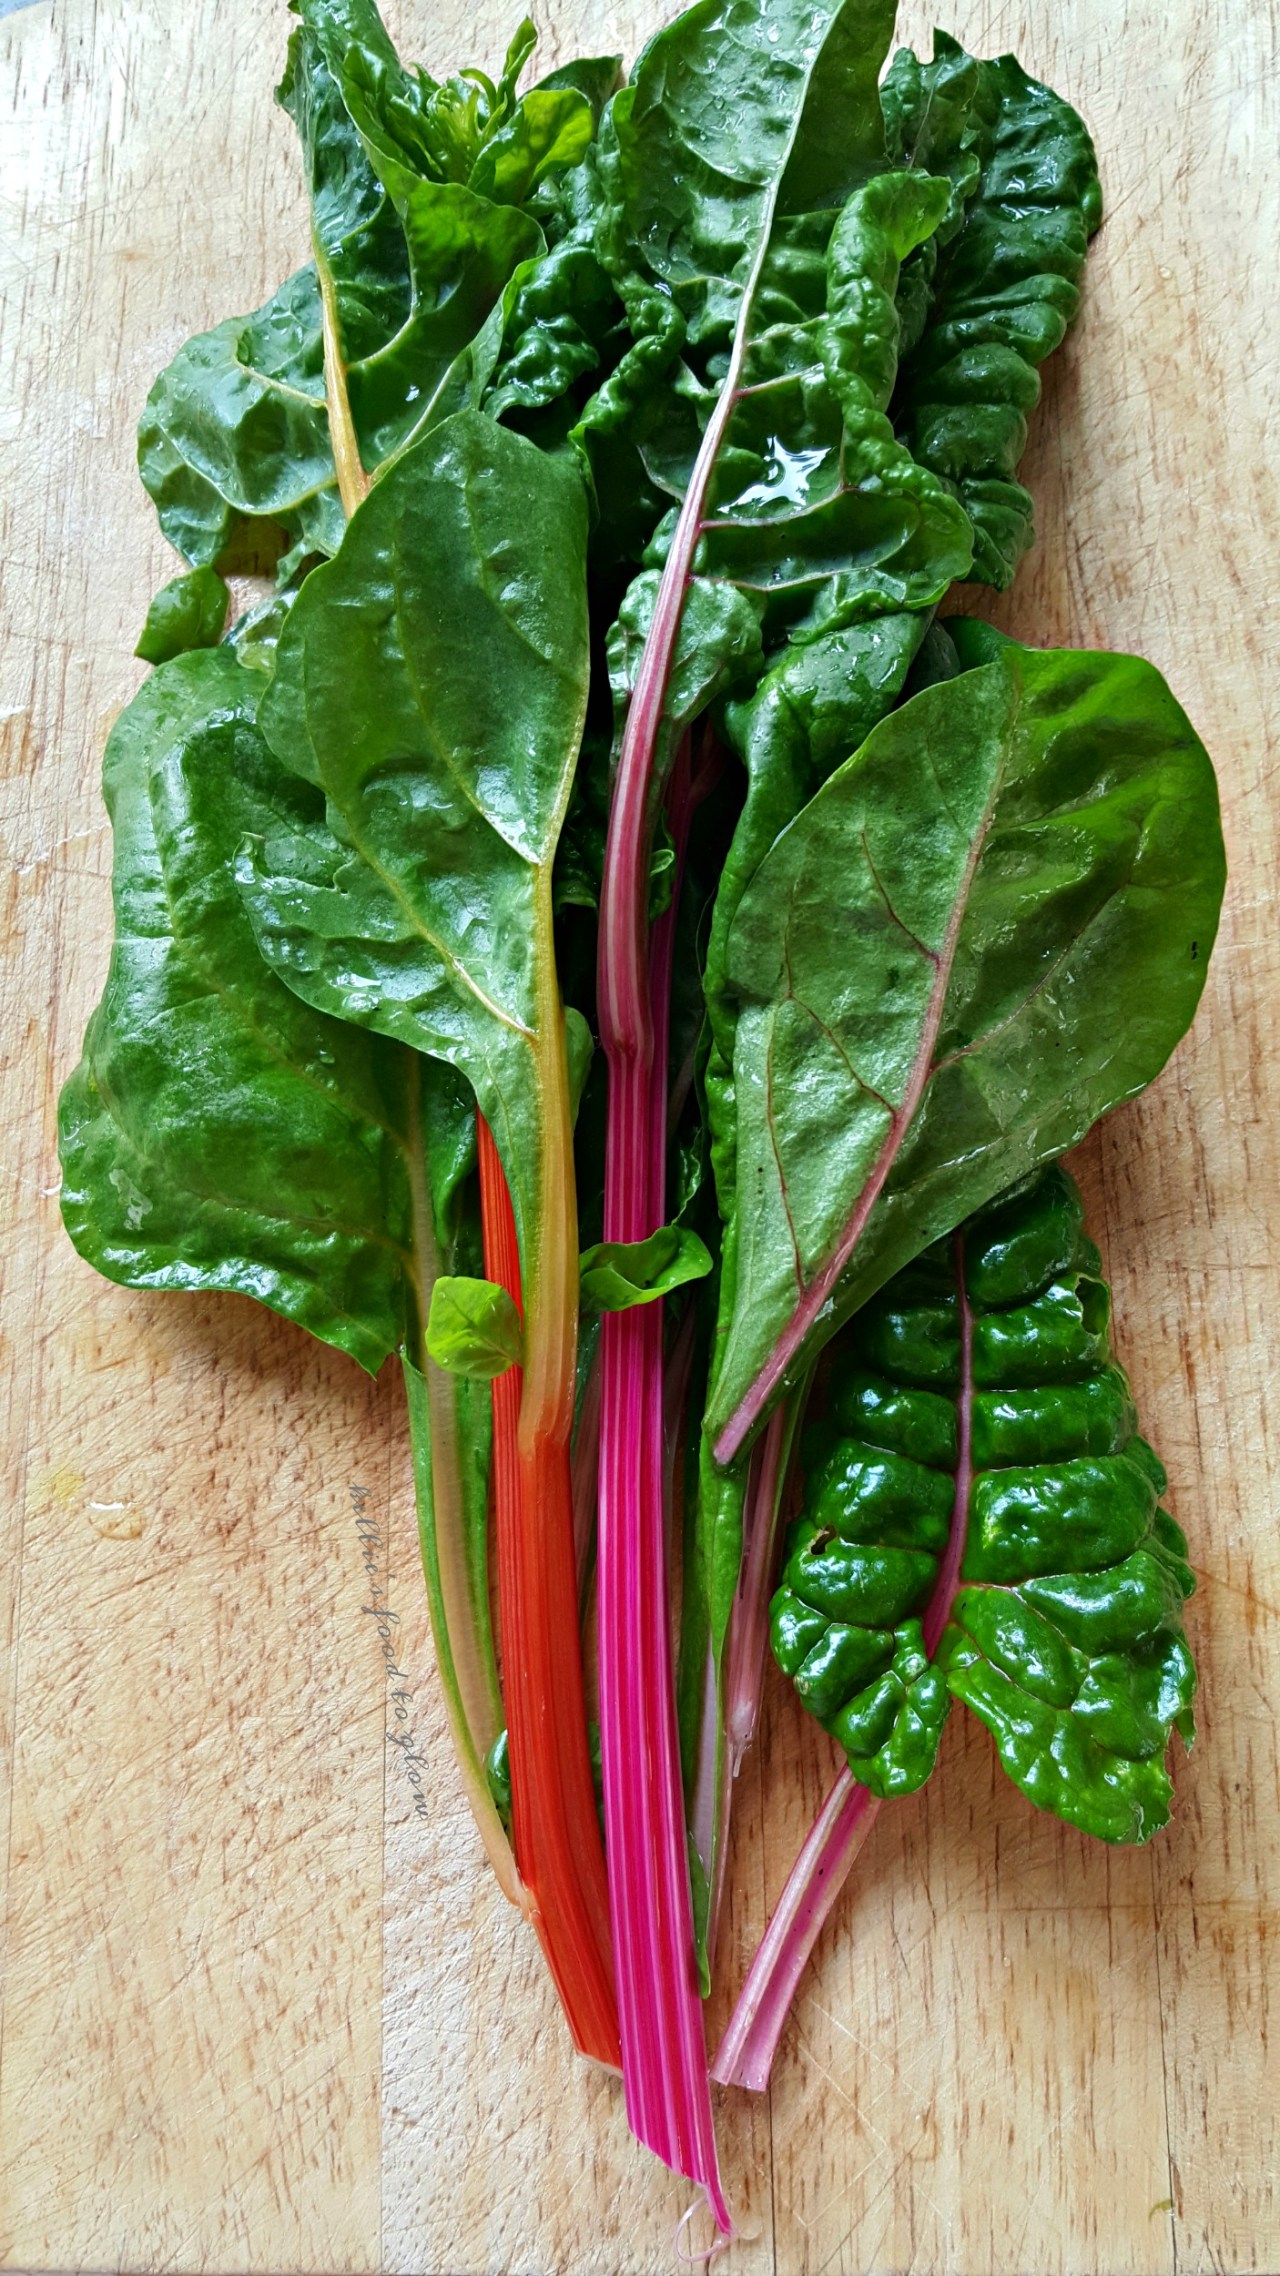 scottish garden chard - kelliesfoodtoglow.com